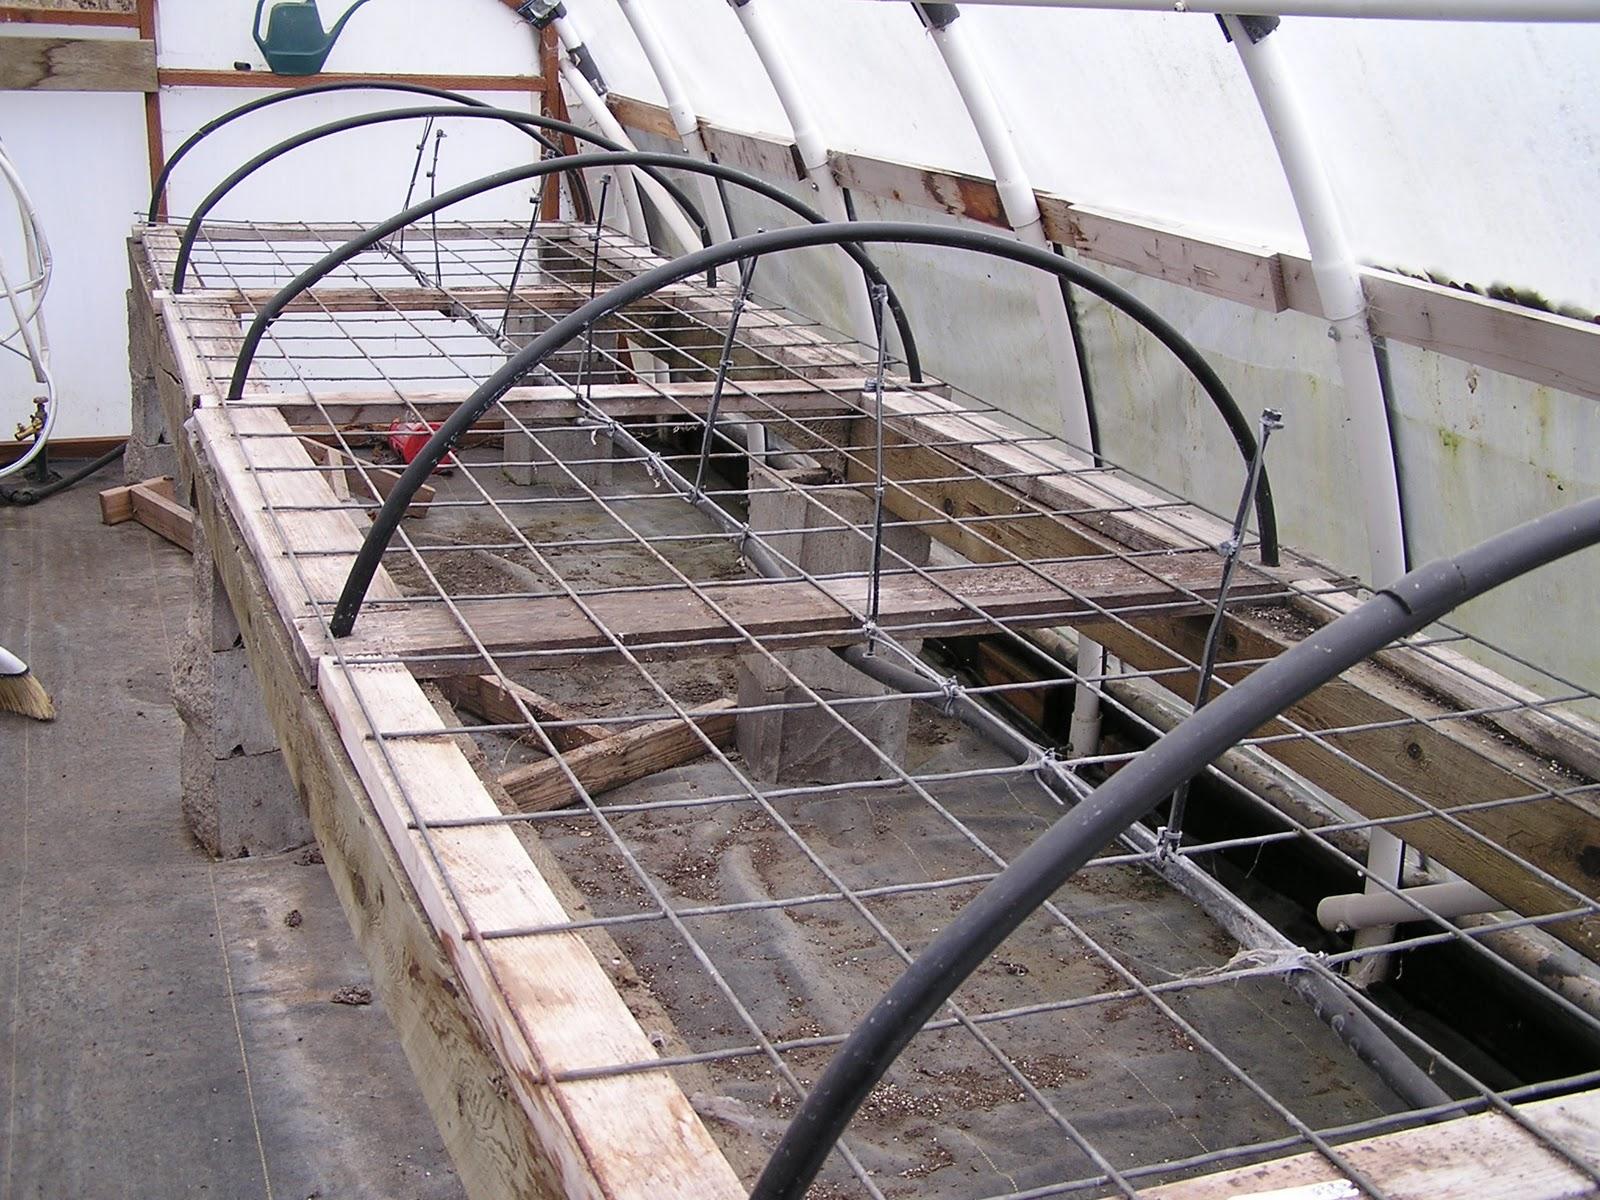 Bare Mtn Farm: A Little Winter Project....